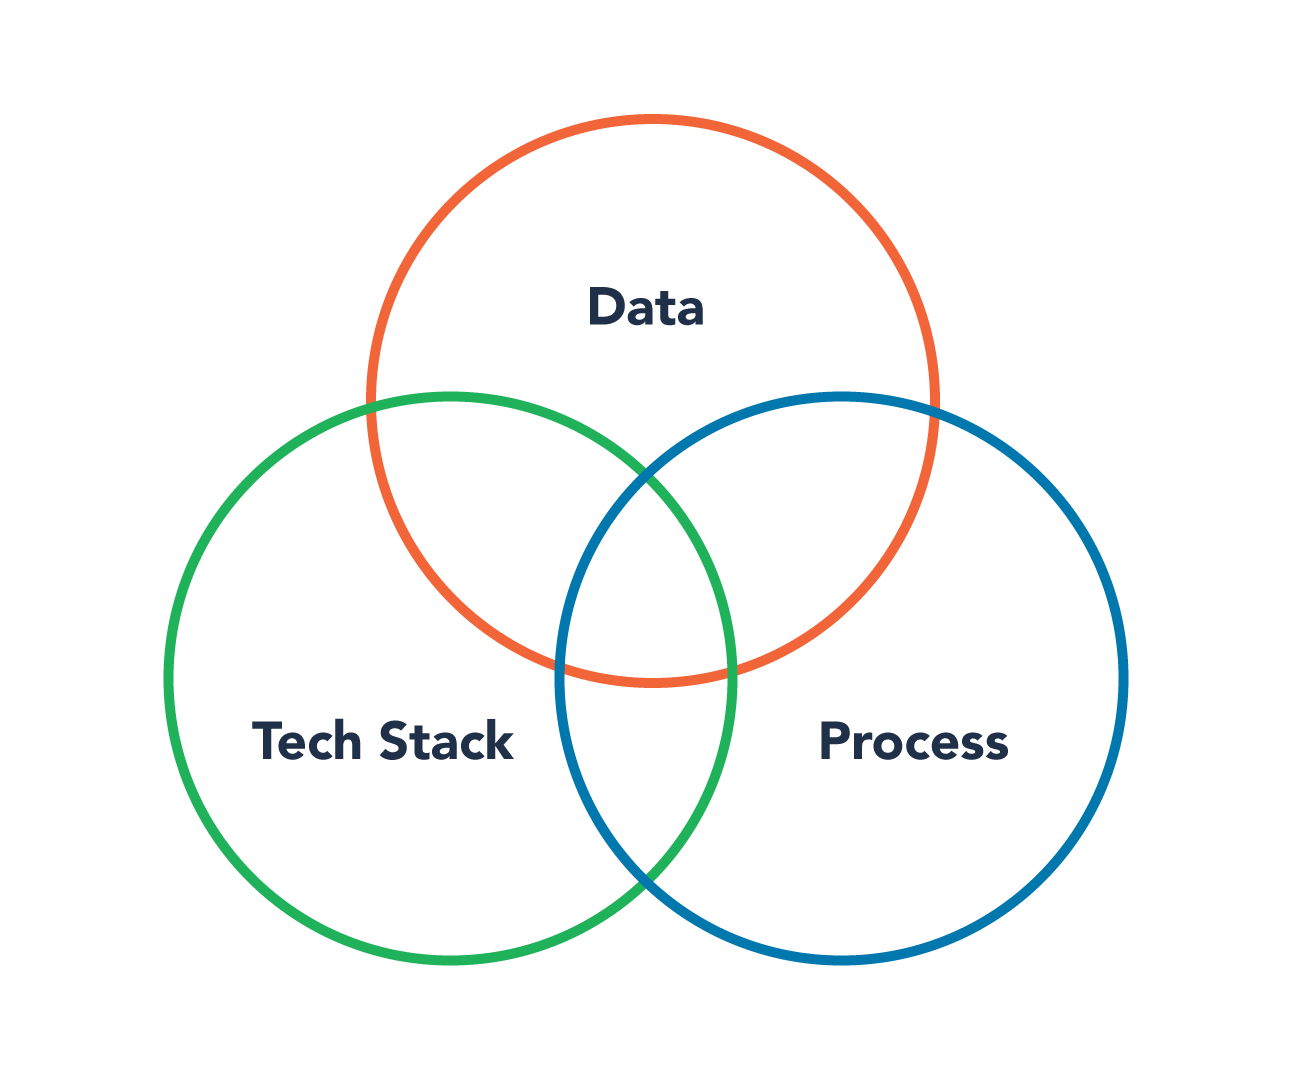 Data Tech Stack Process